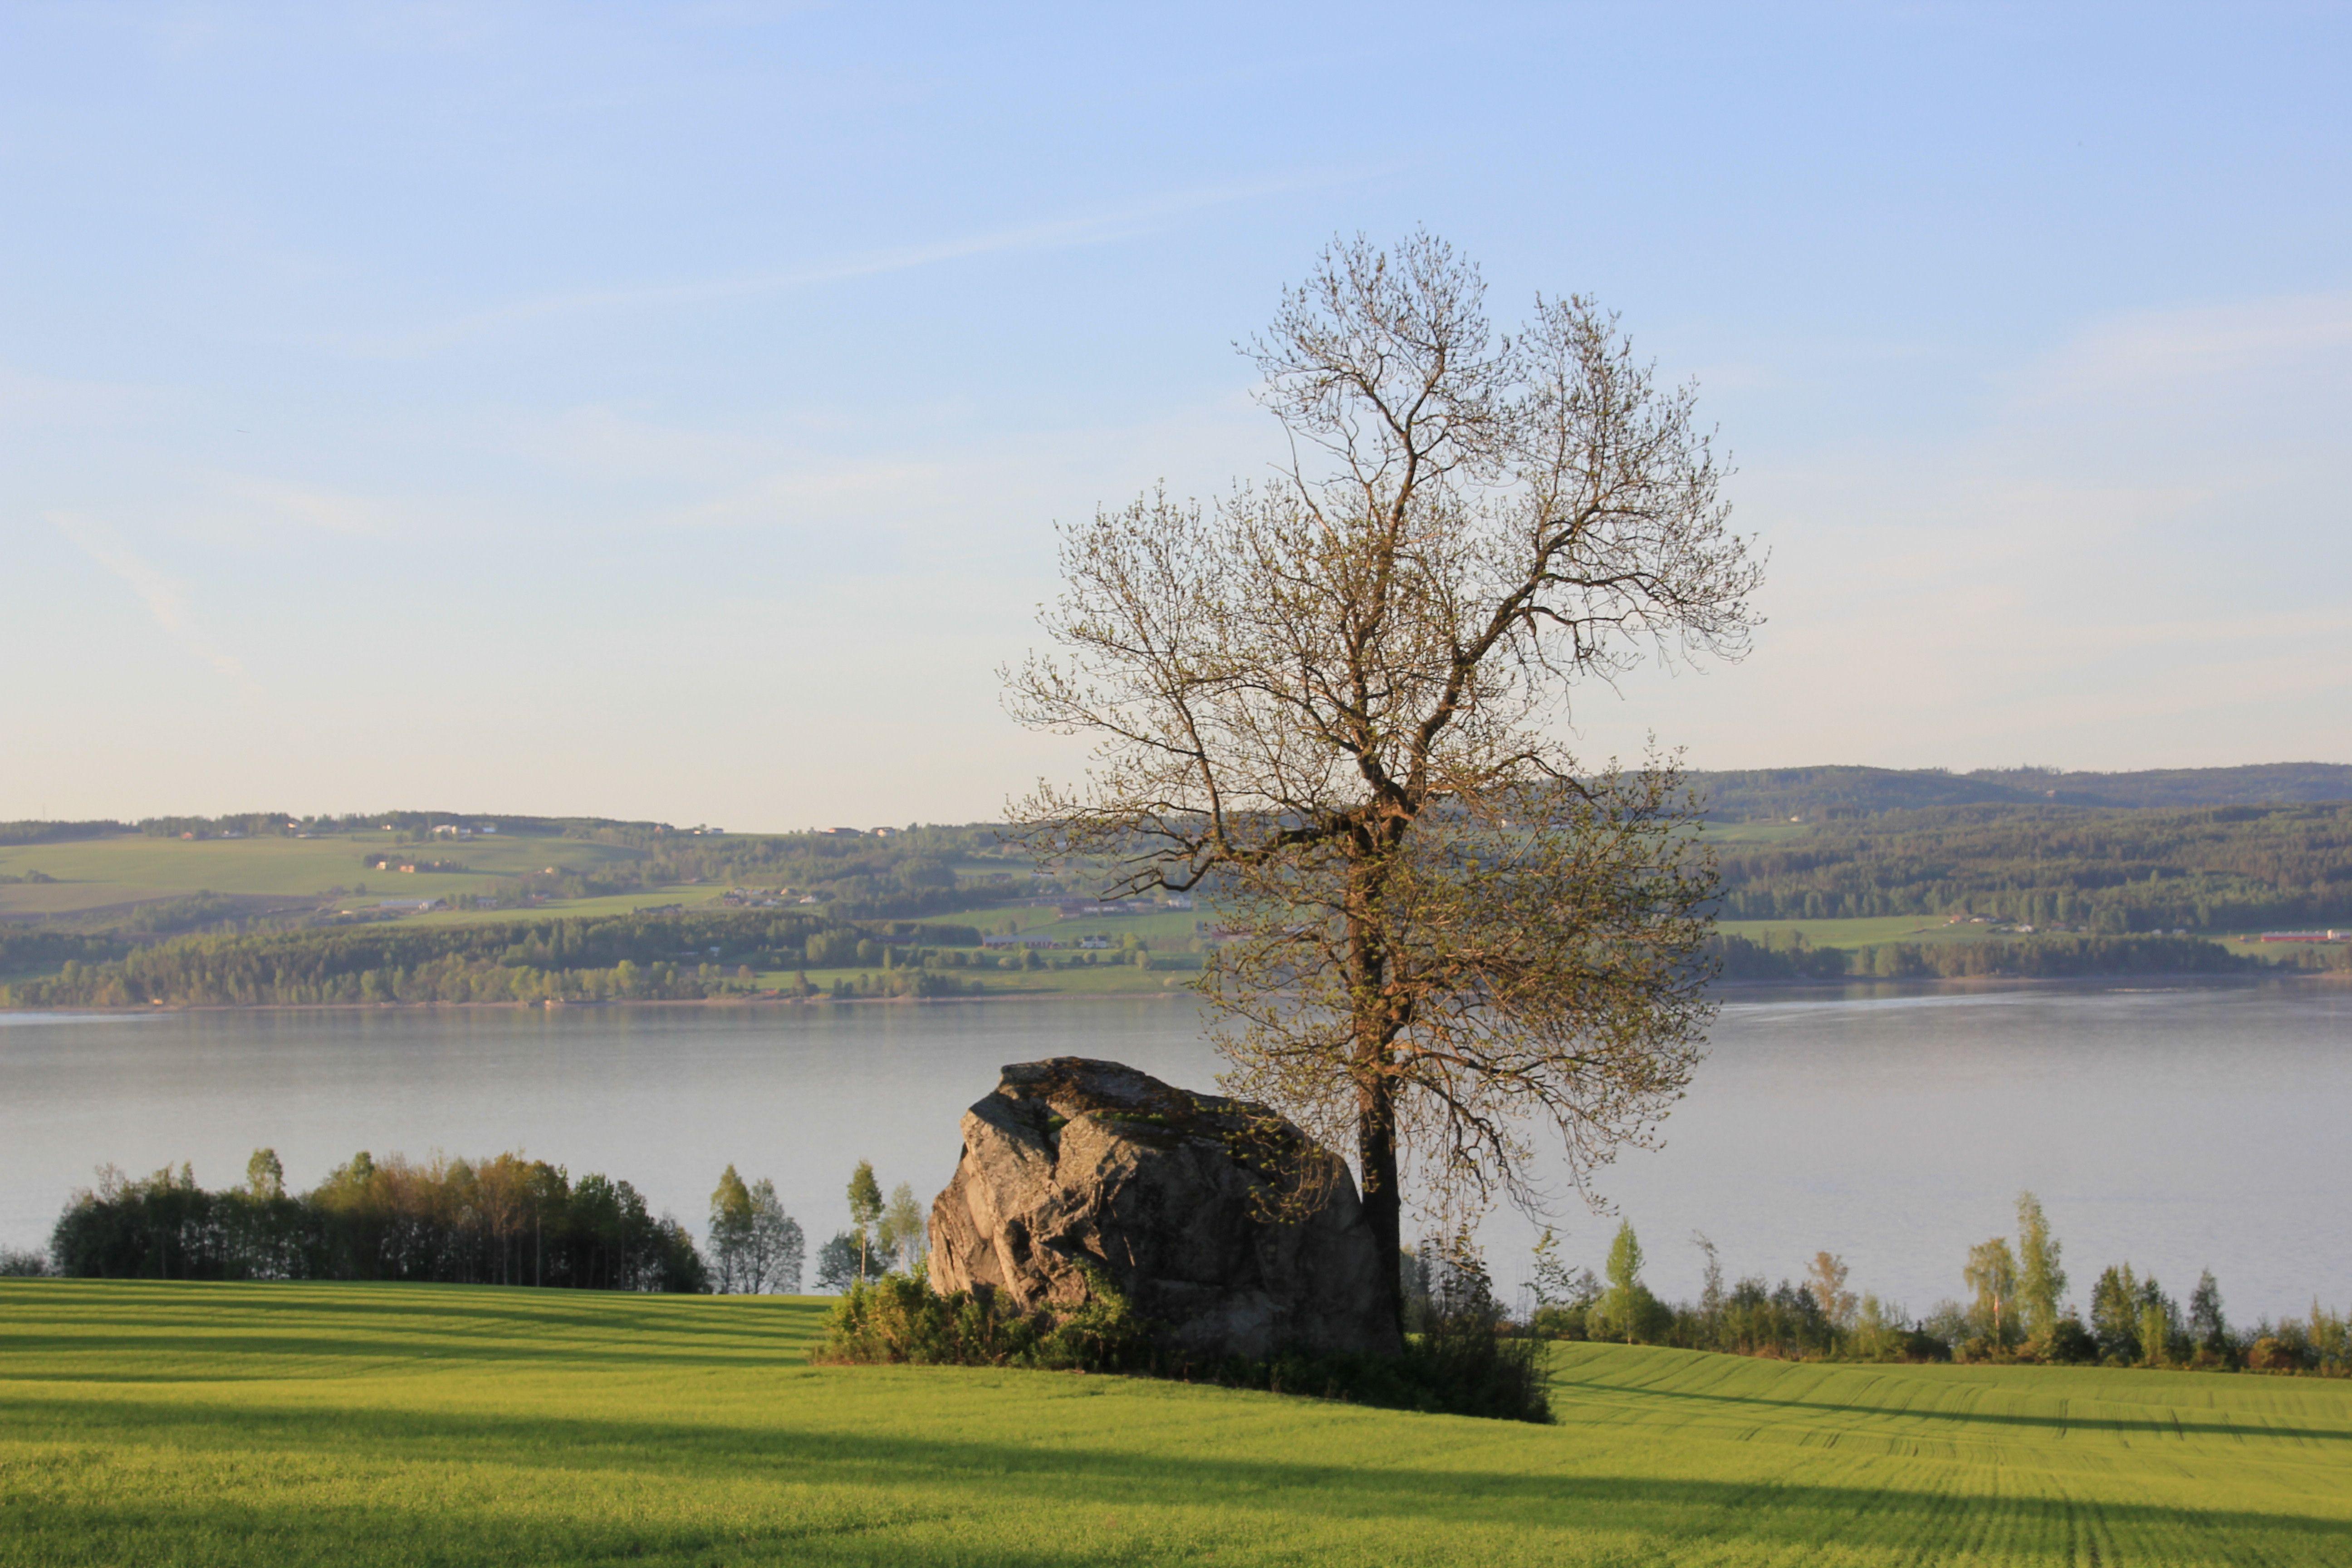 Østre Toten, Oppland, Norway - Google Search.  Giant stone on a field at Nordlia, Østre Toten, Oppland, Norway. Lake Mjøsa in the background. Kampesteinen ved Nordlia på Østre Toten: photo by Øyvind ...